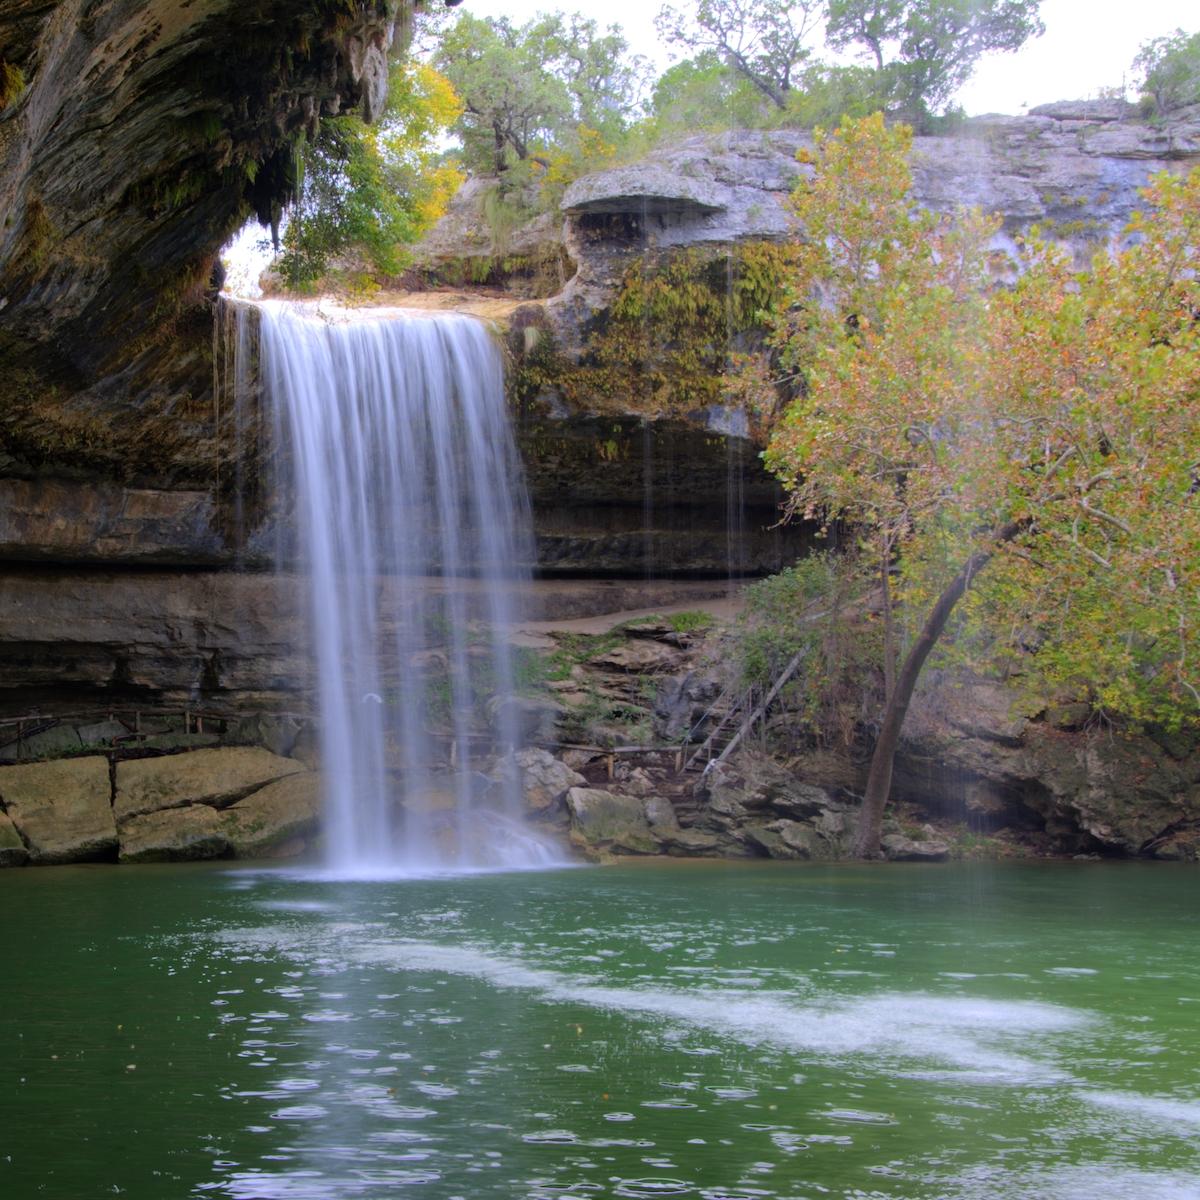 Hamilton Pool Preserve; Dripping Springs, Texas